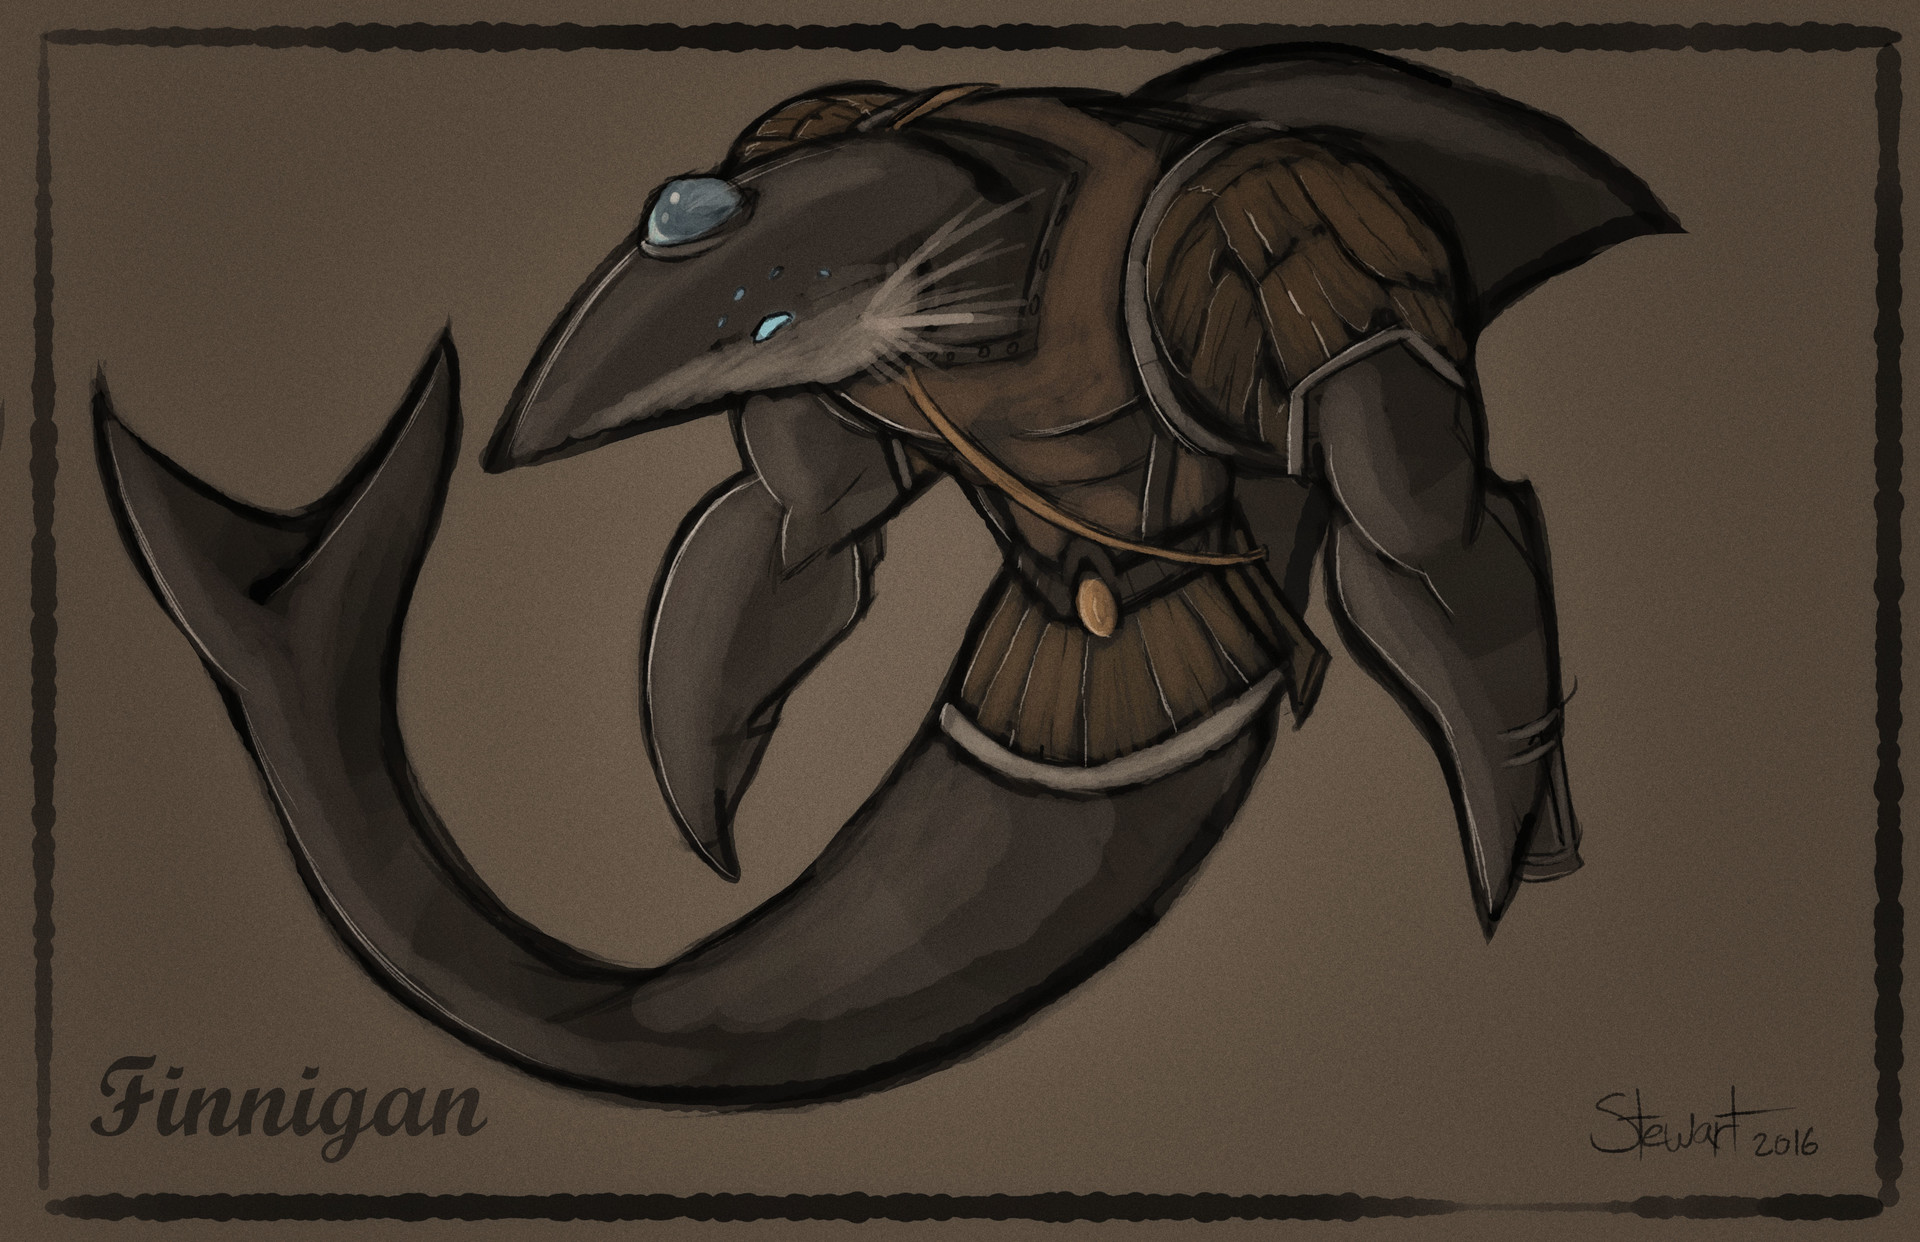 Finnigan the Warrior Shark